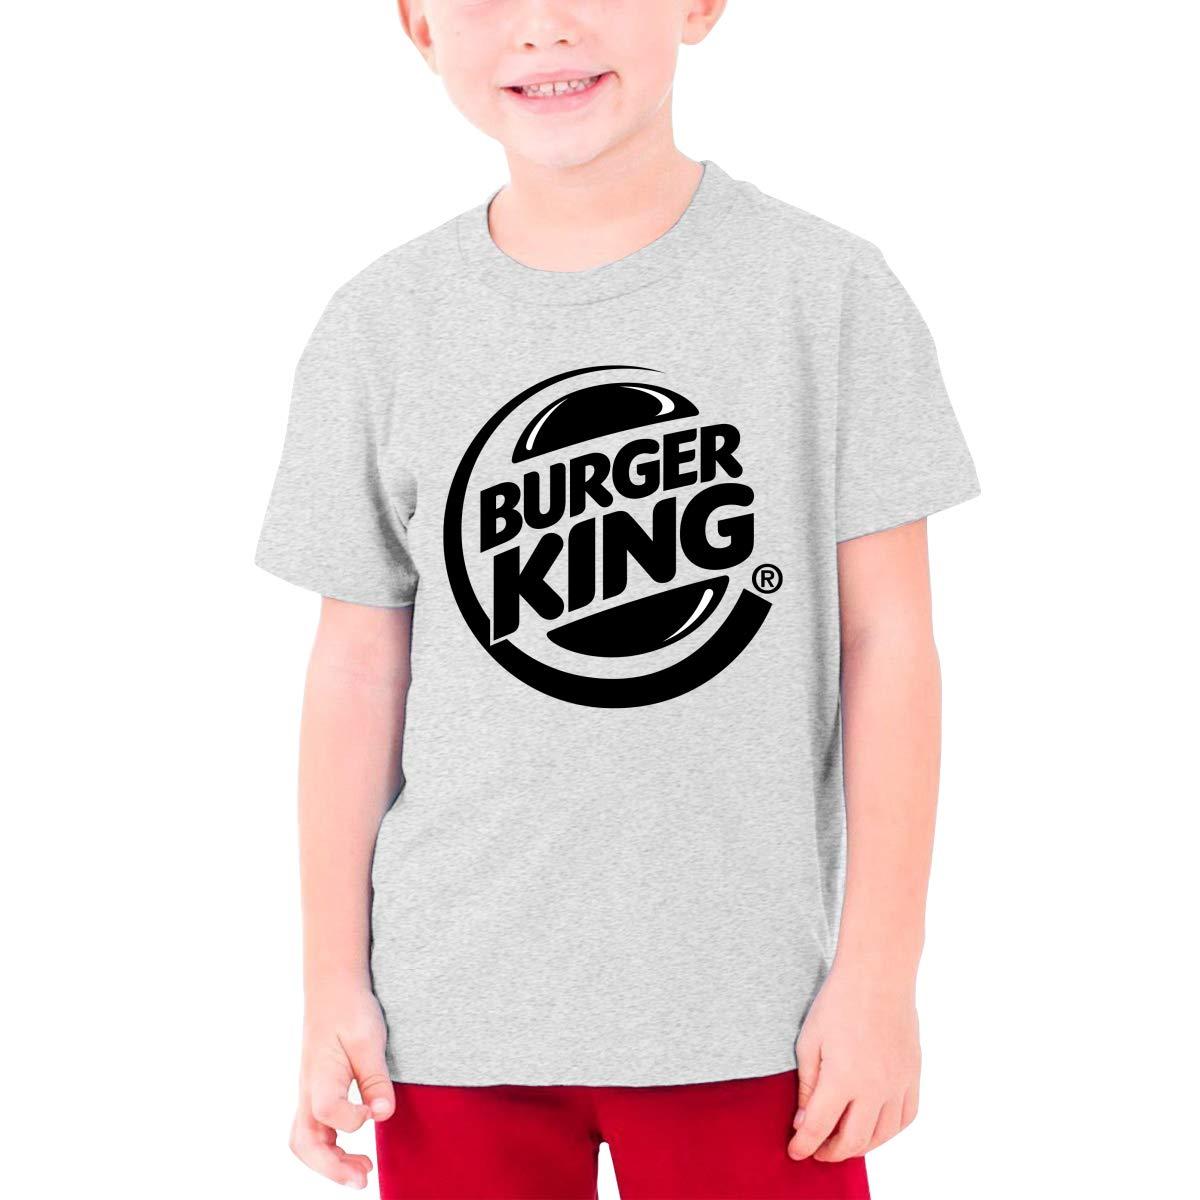 Nyanhif Personalized Burger-King-Logo Black Funny T Shirt Short Sleeve for Minor Black